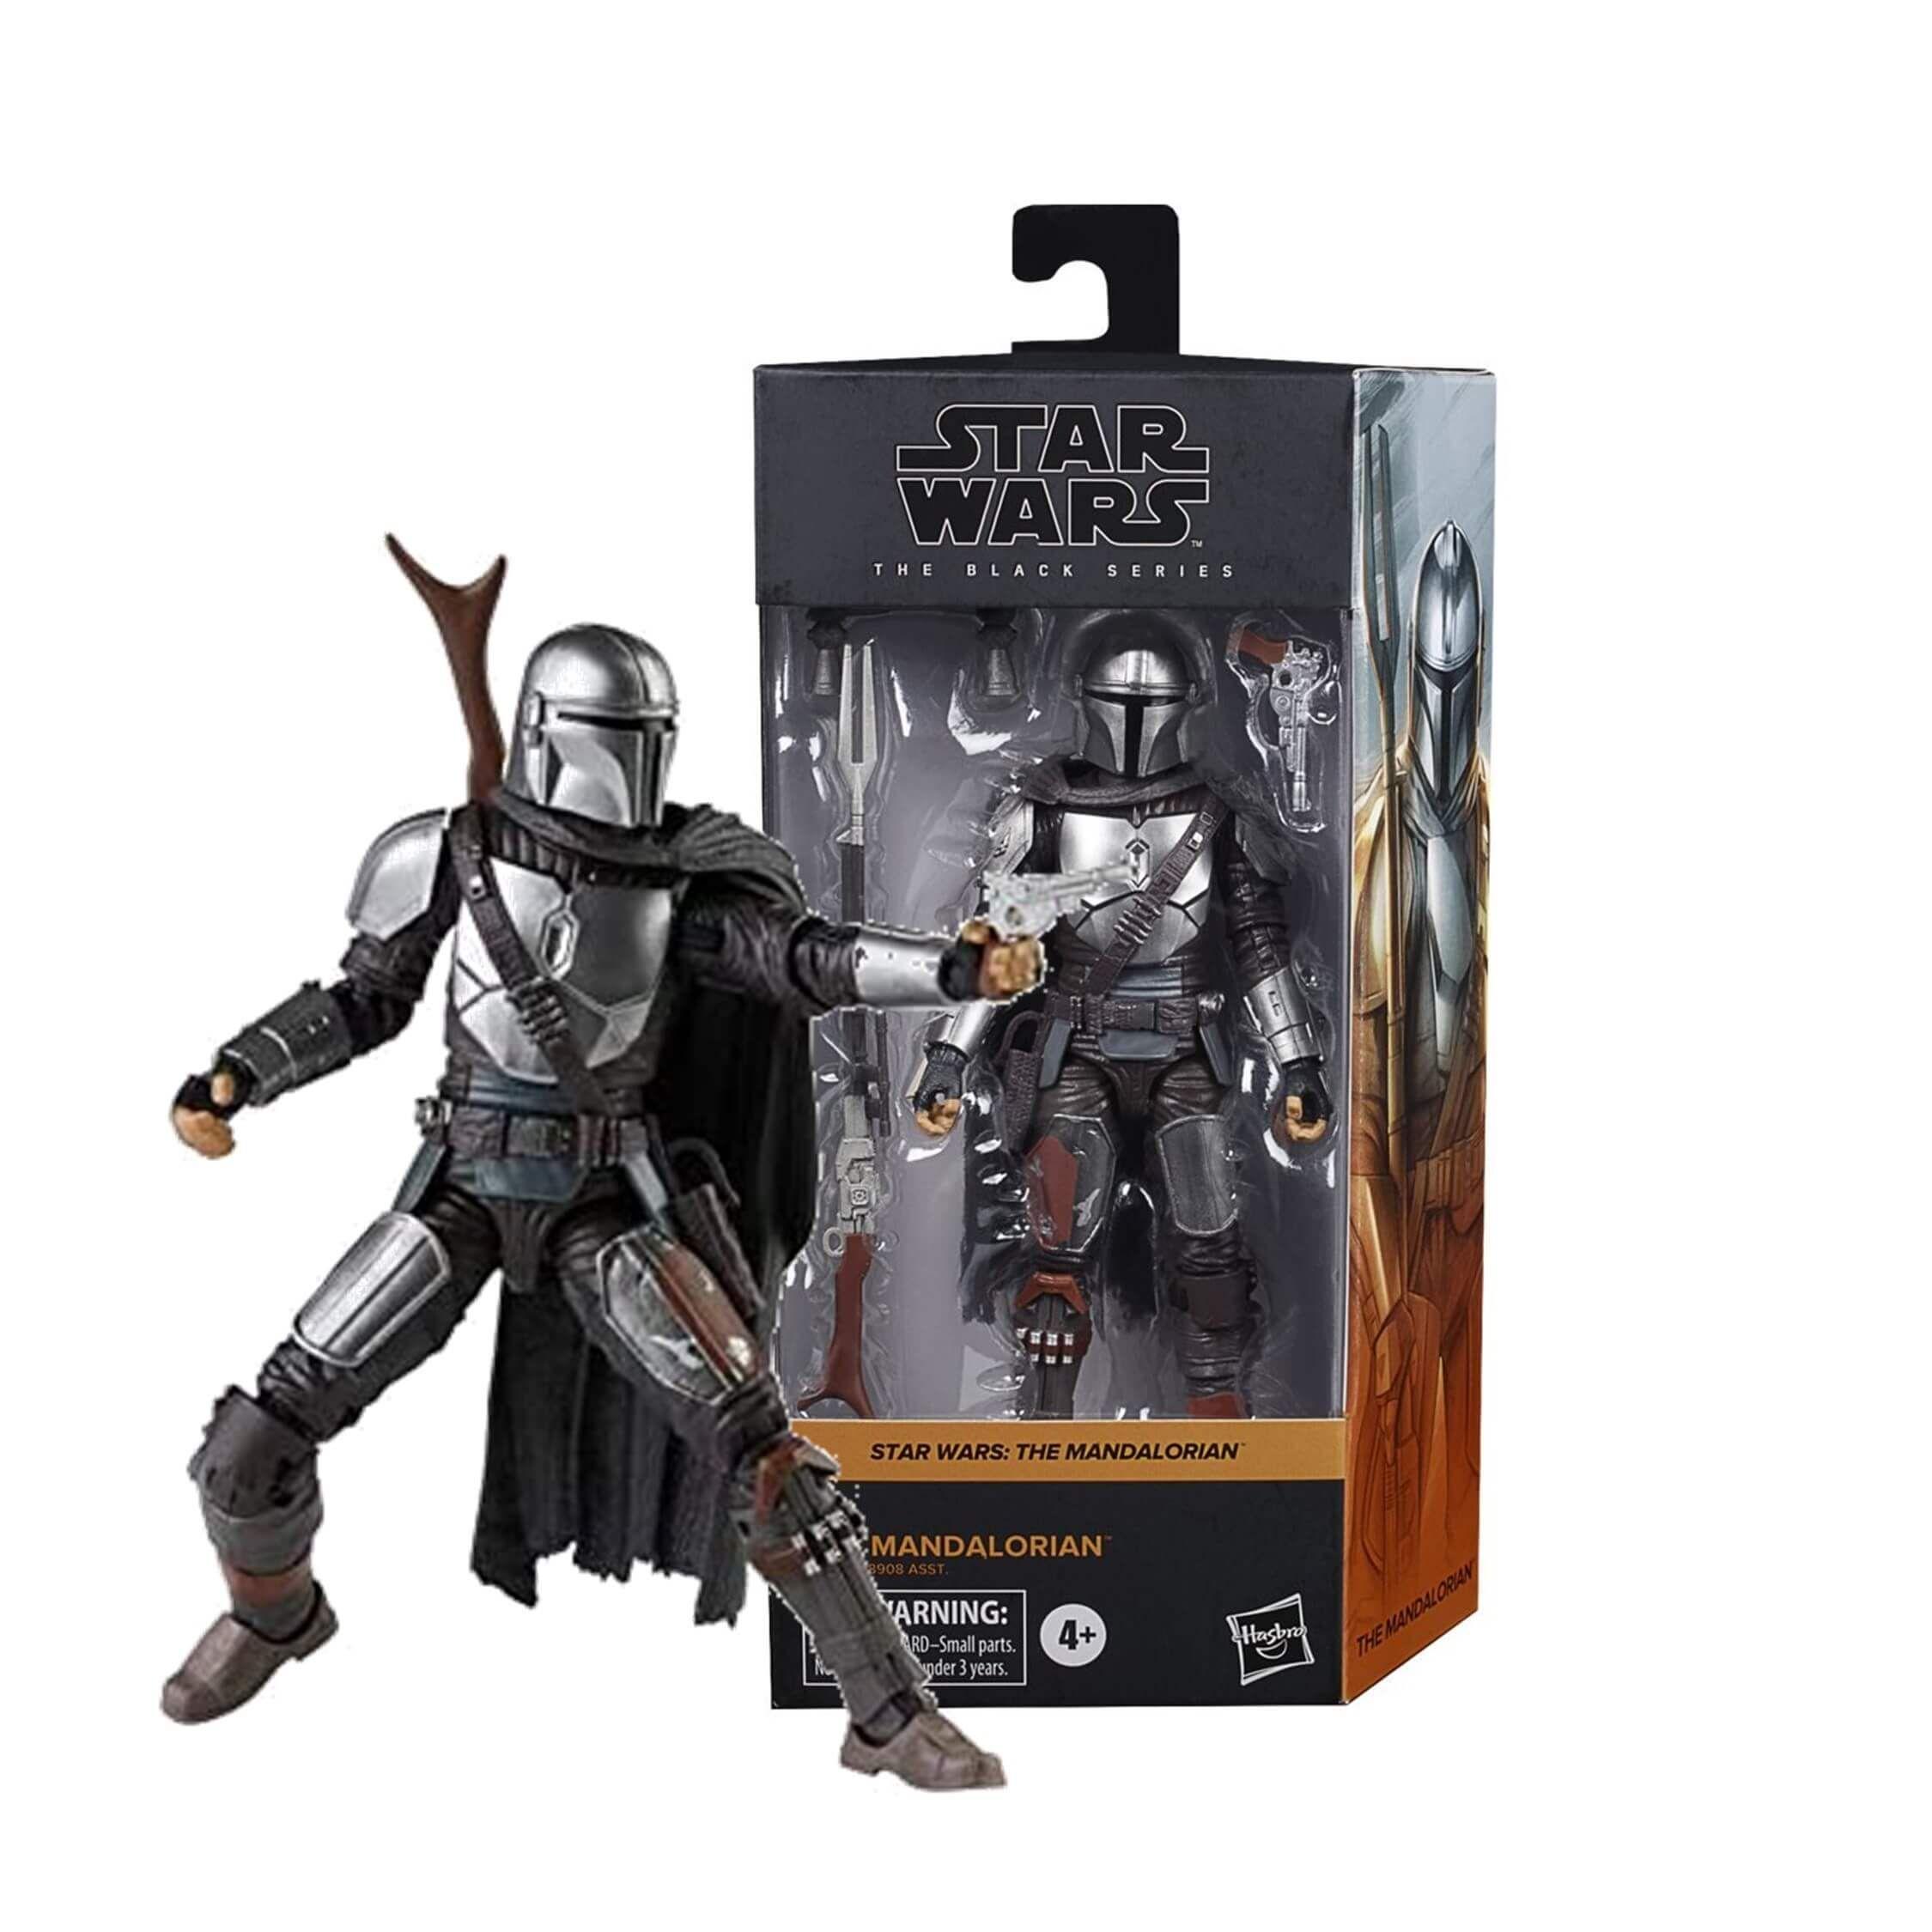 Star Wars Black Series Mandalorian Beskar Armor in hand